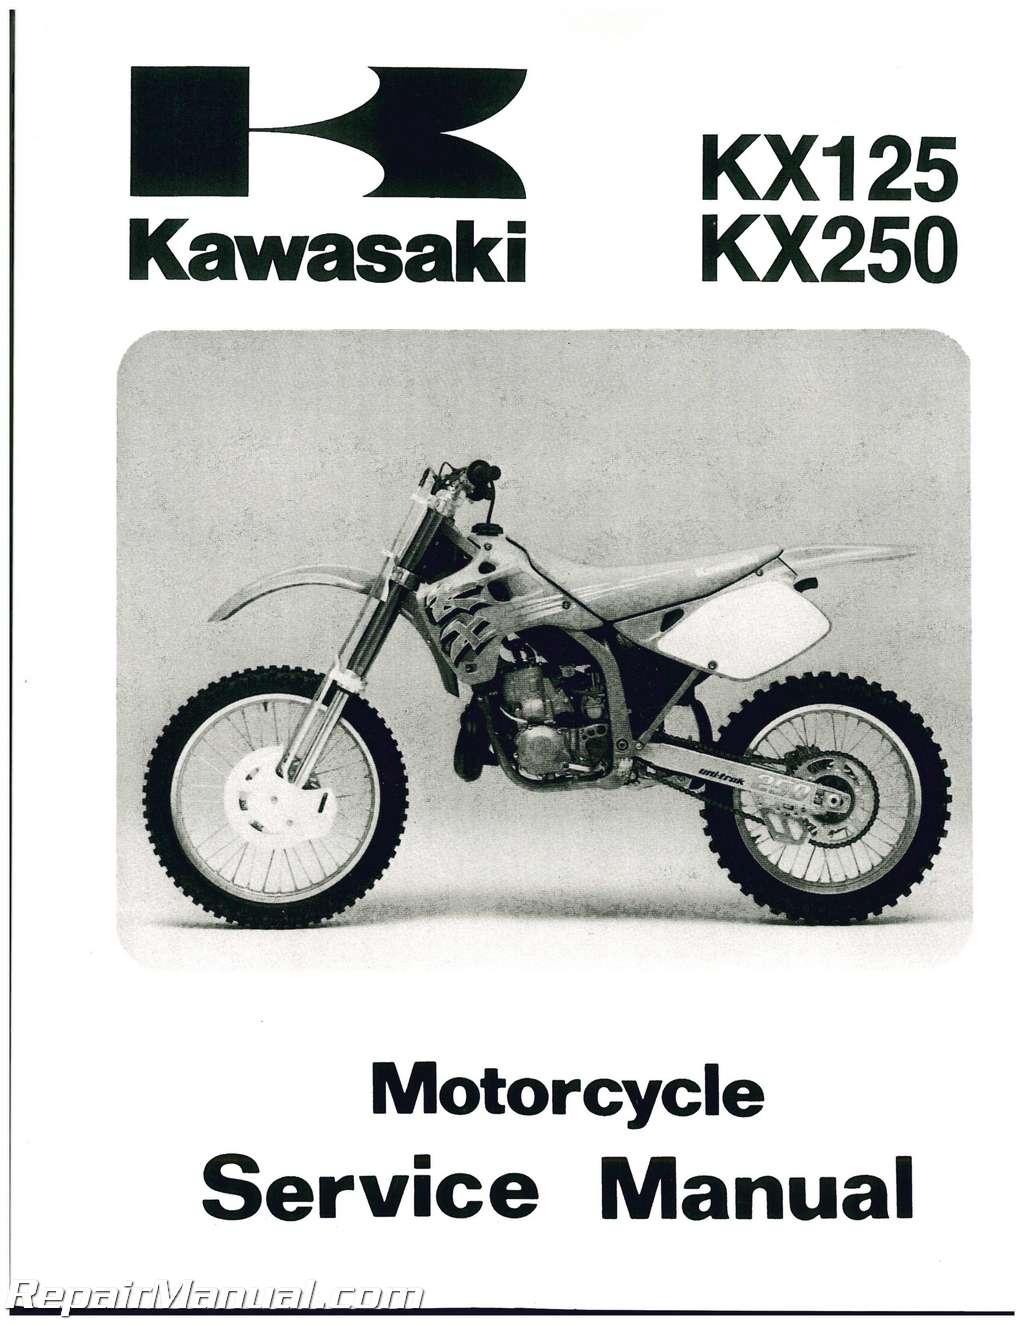 Motorcycle Manuals PDF Wiring Diagrams DTC